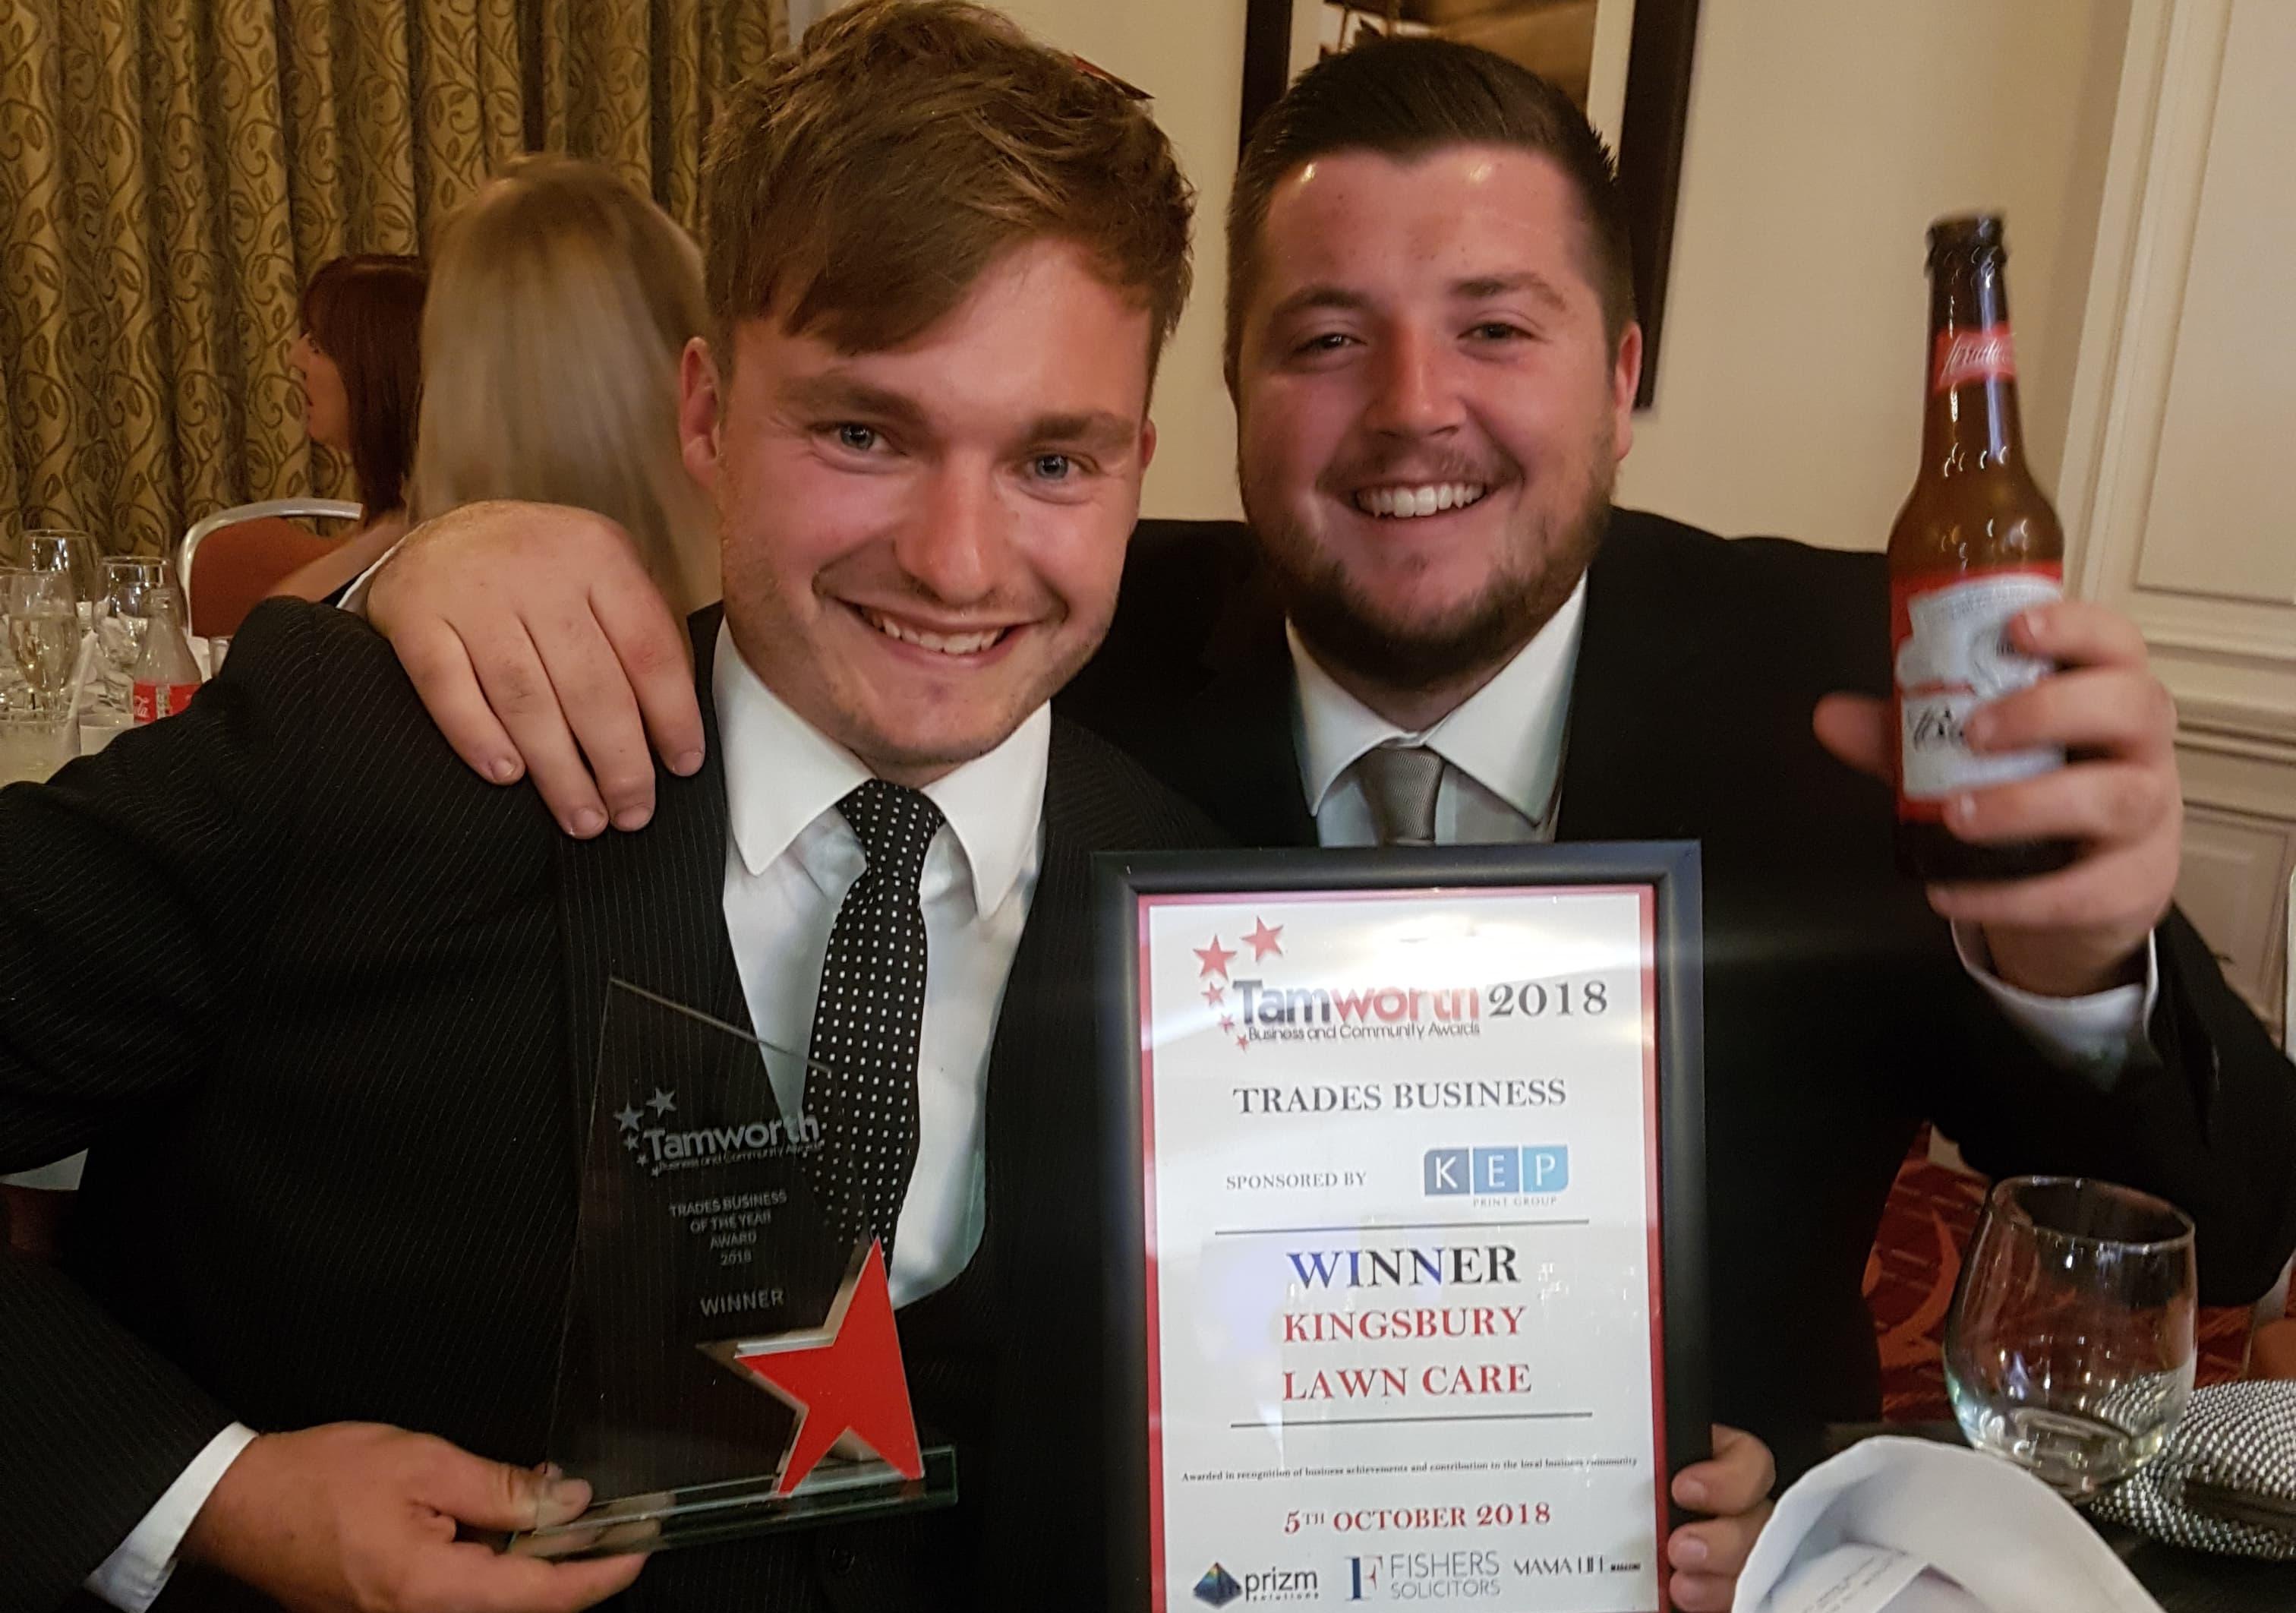 Award winning lawn care business